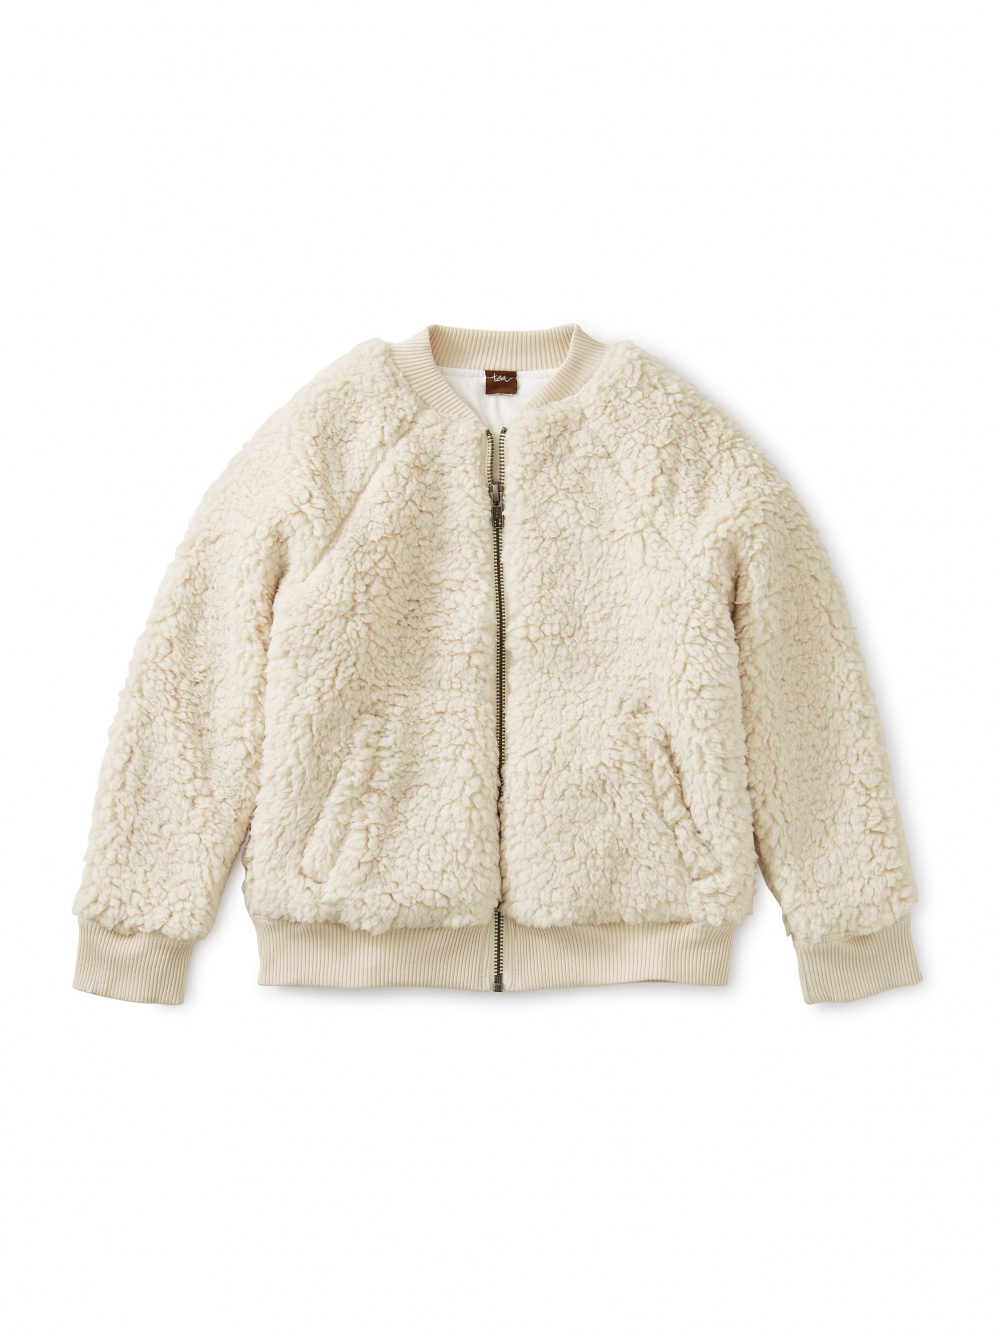 Sherpa Fleece Bomber Jacket